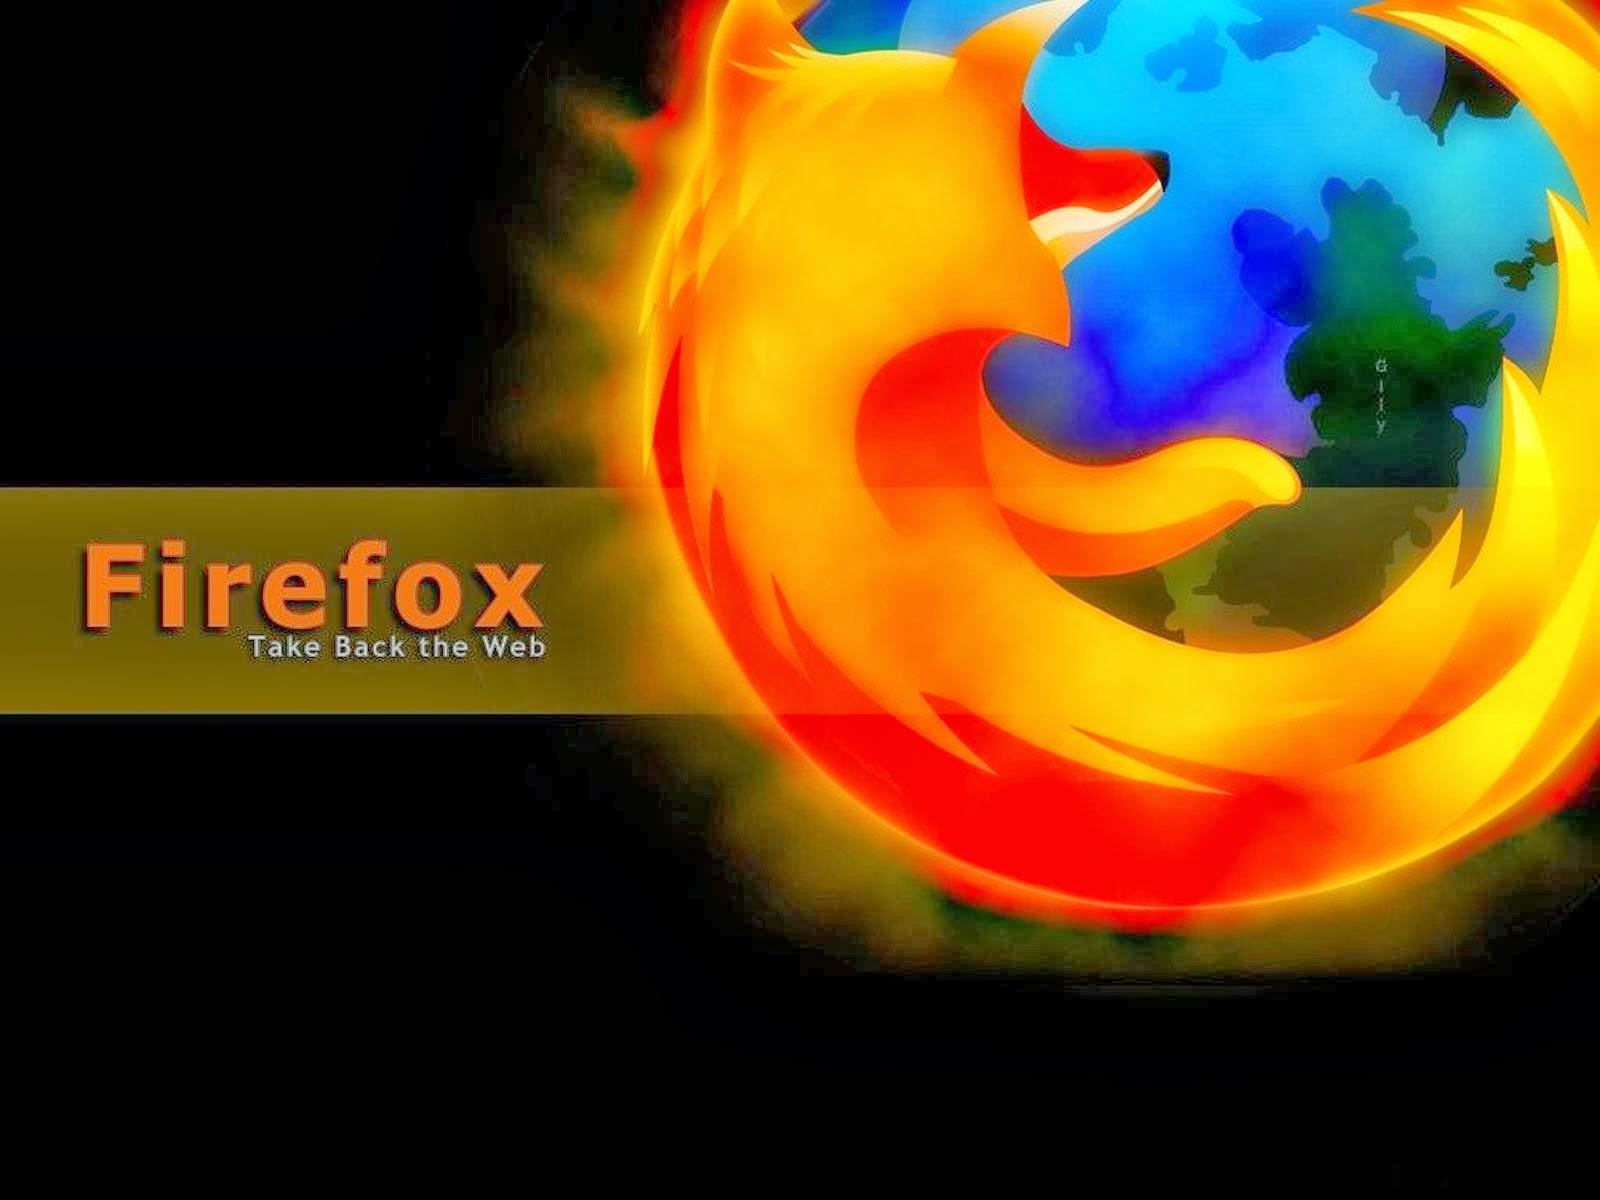 picture firefox take back web wallpaper Latest HD Wallpaper